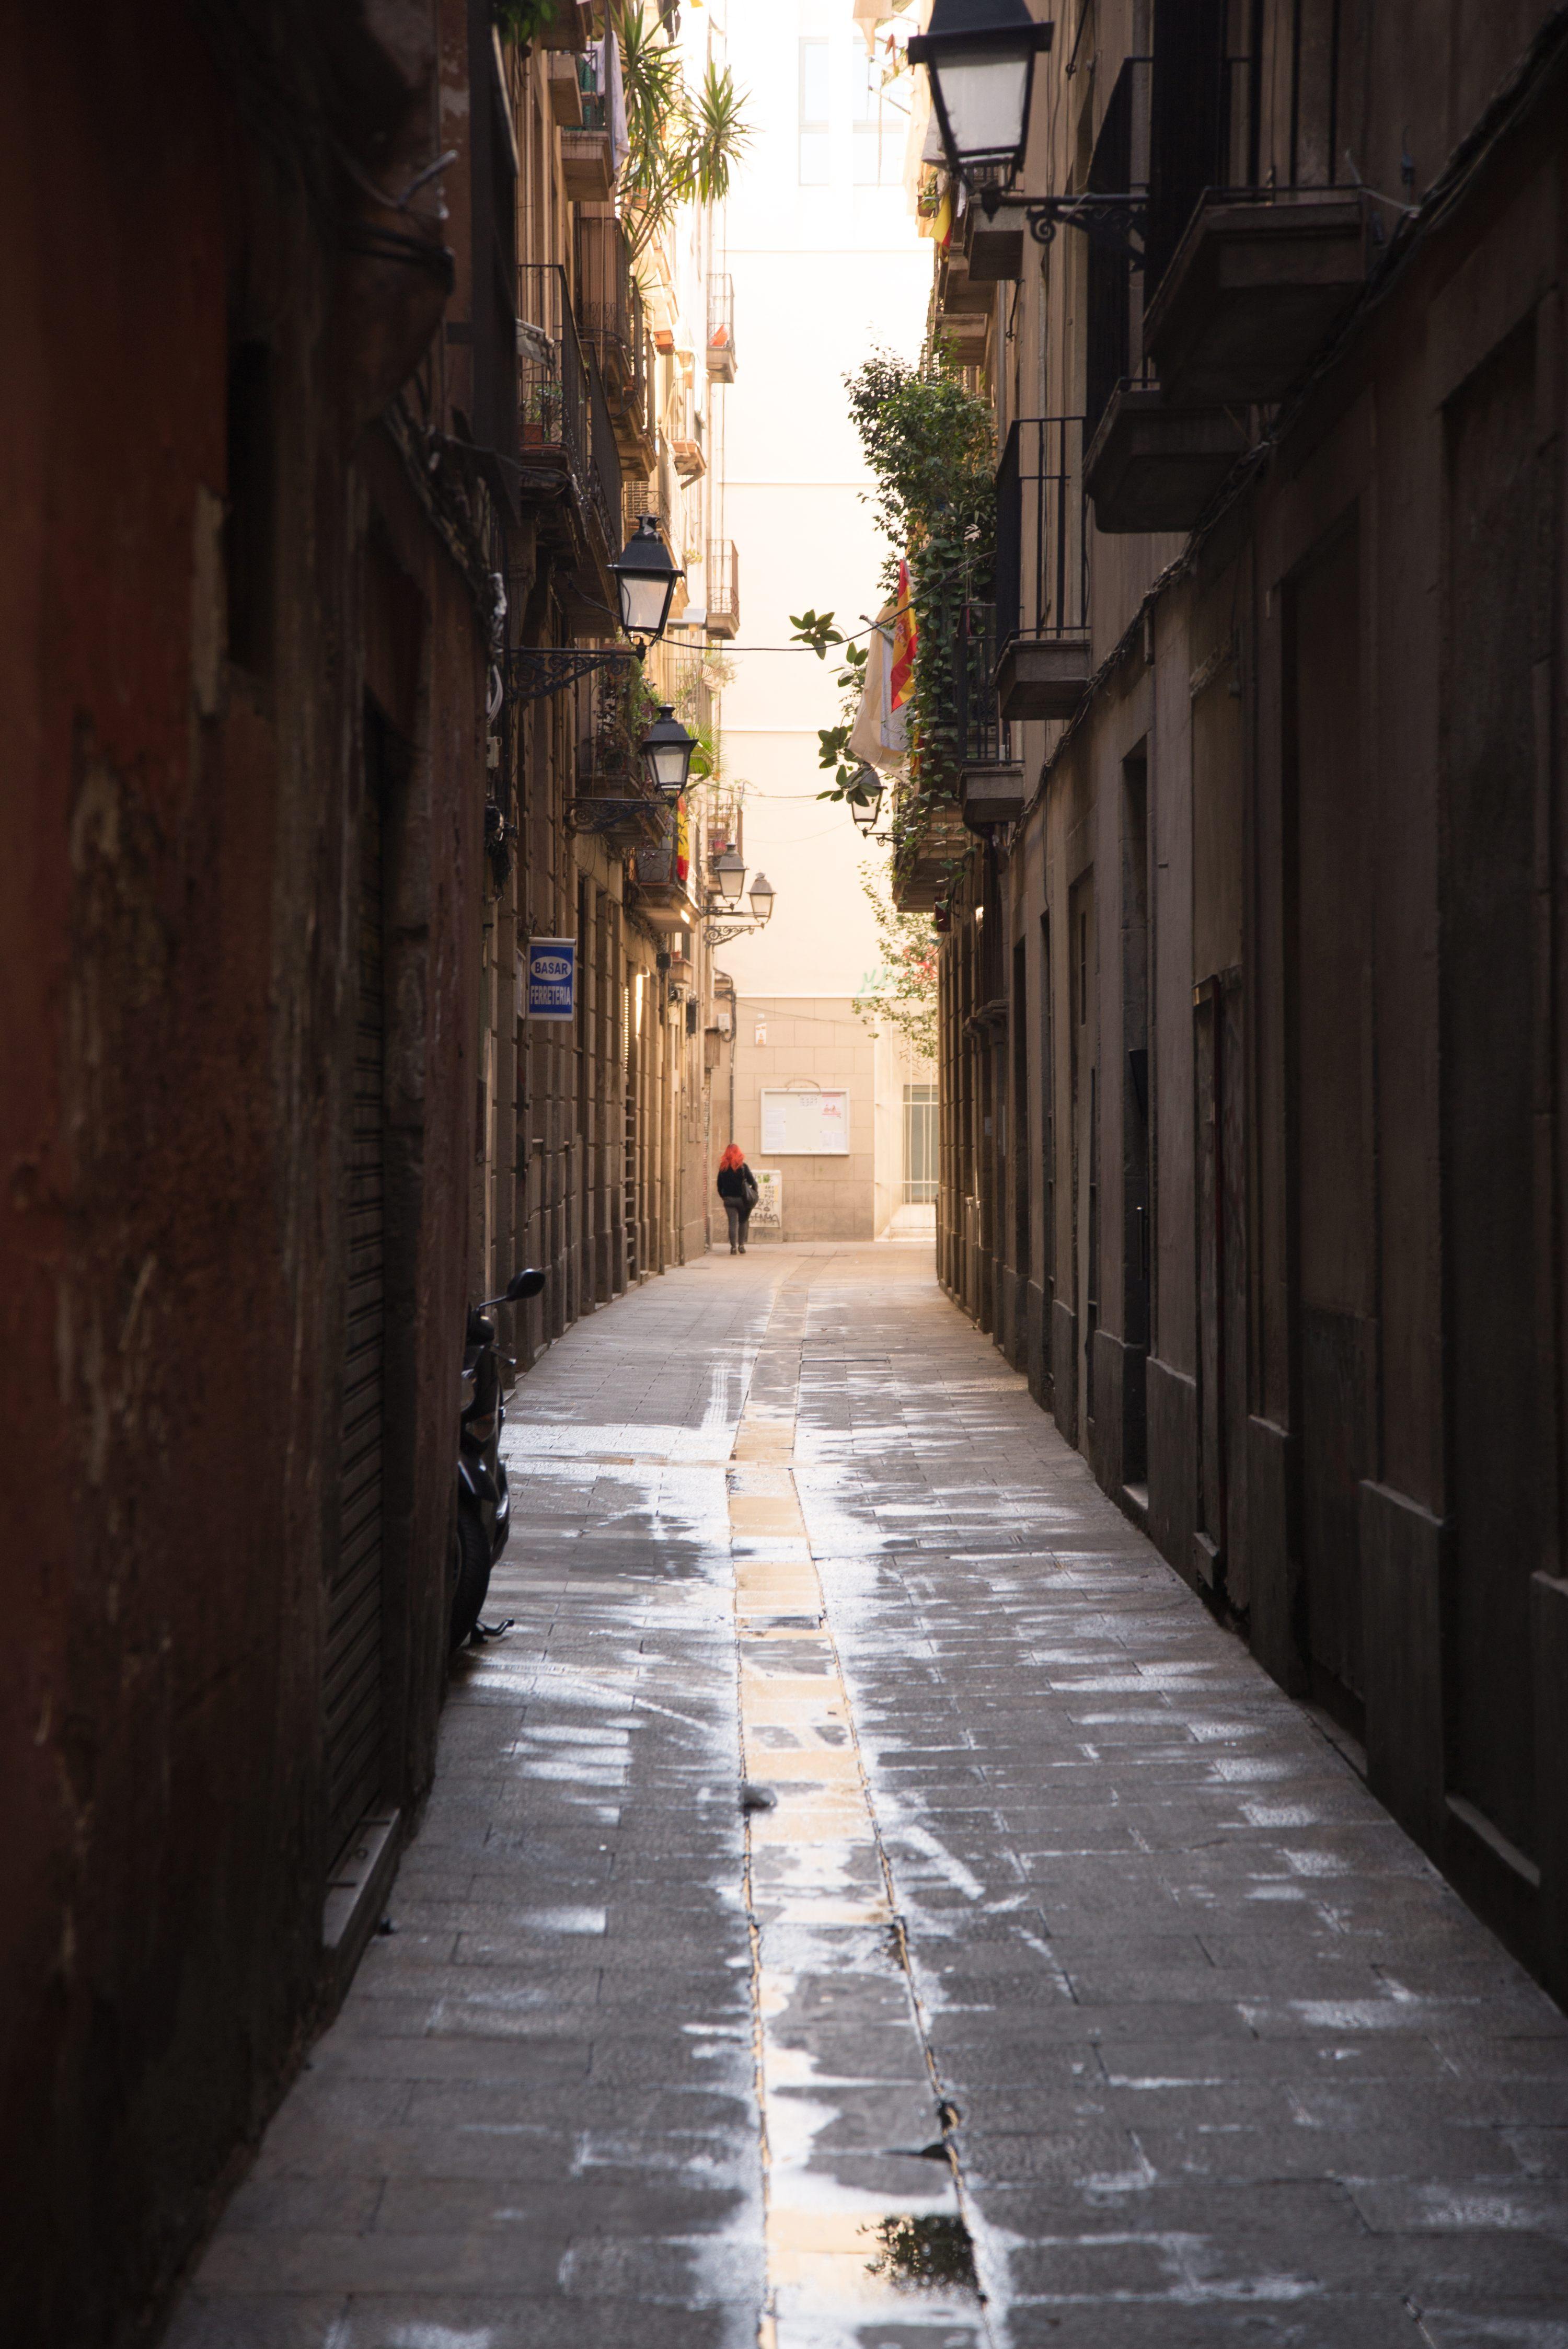 Ghotic quarter, Barcelona